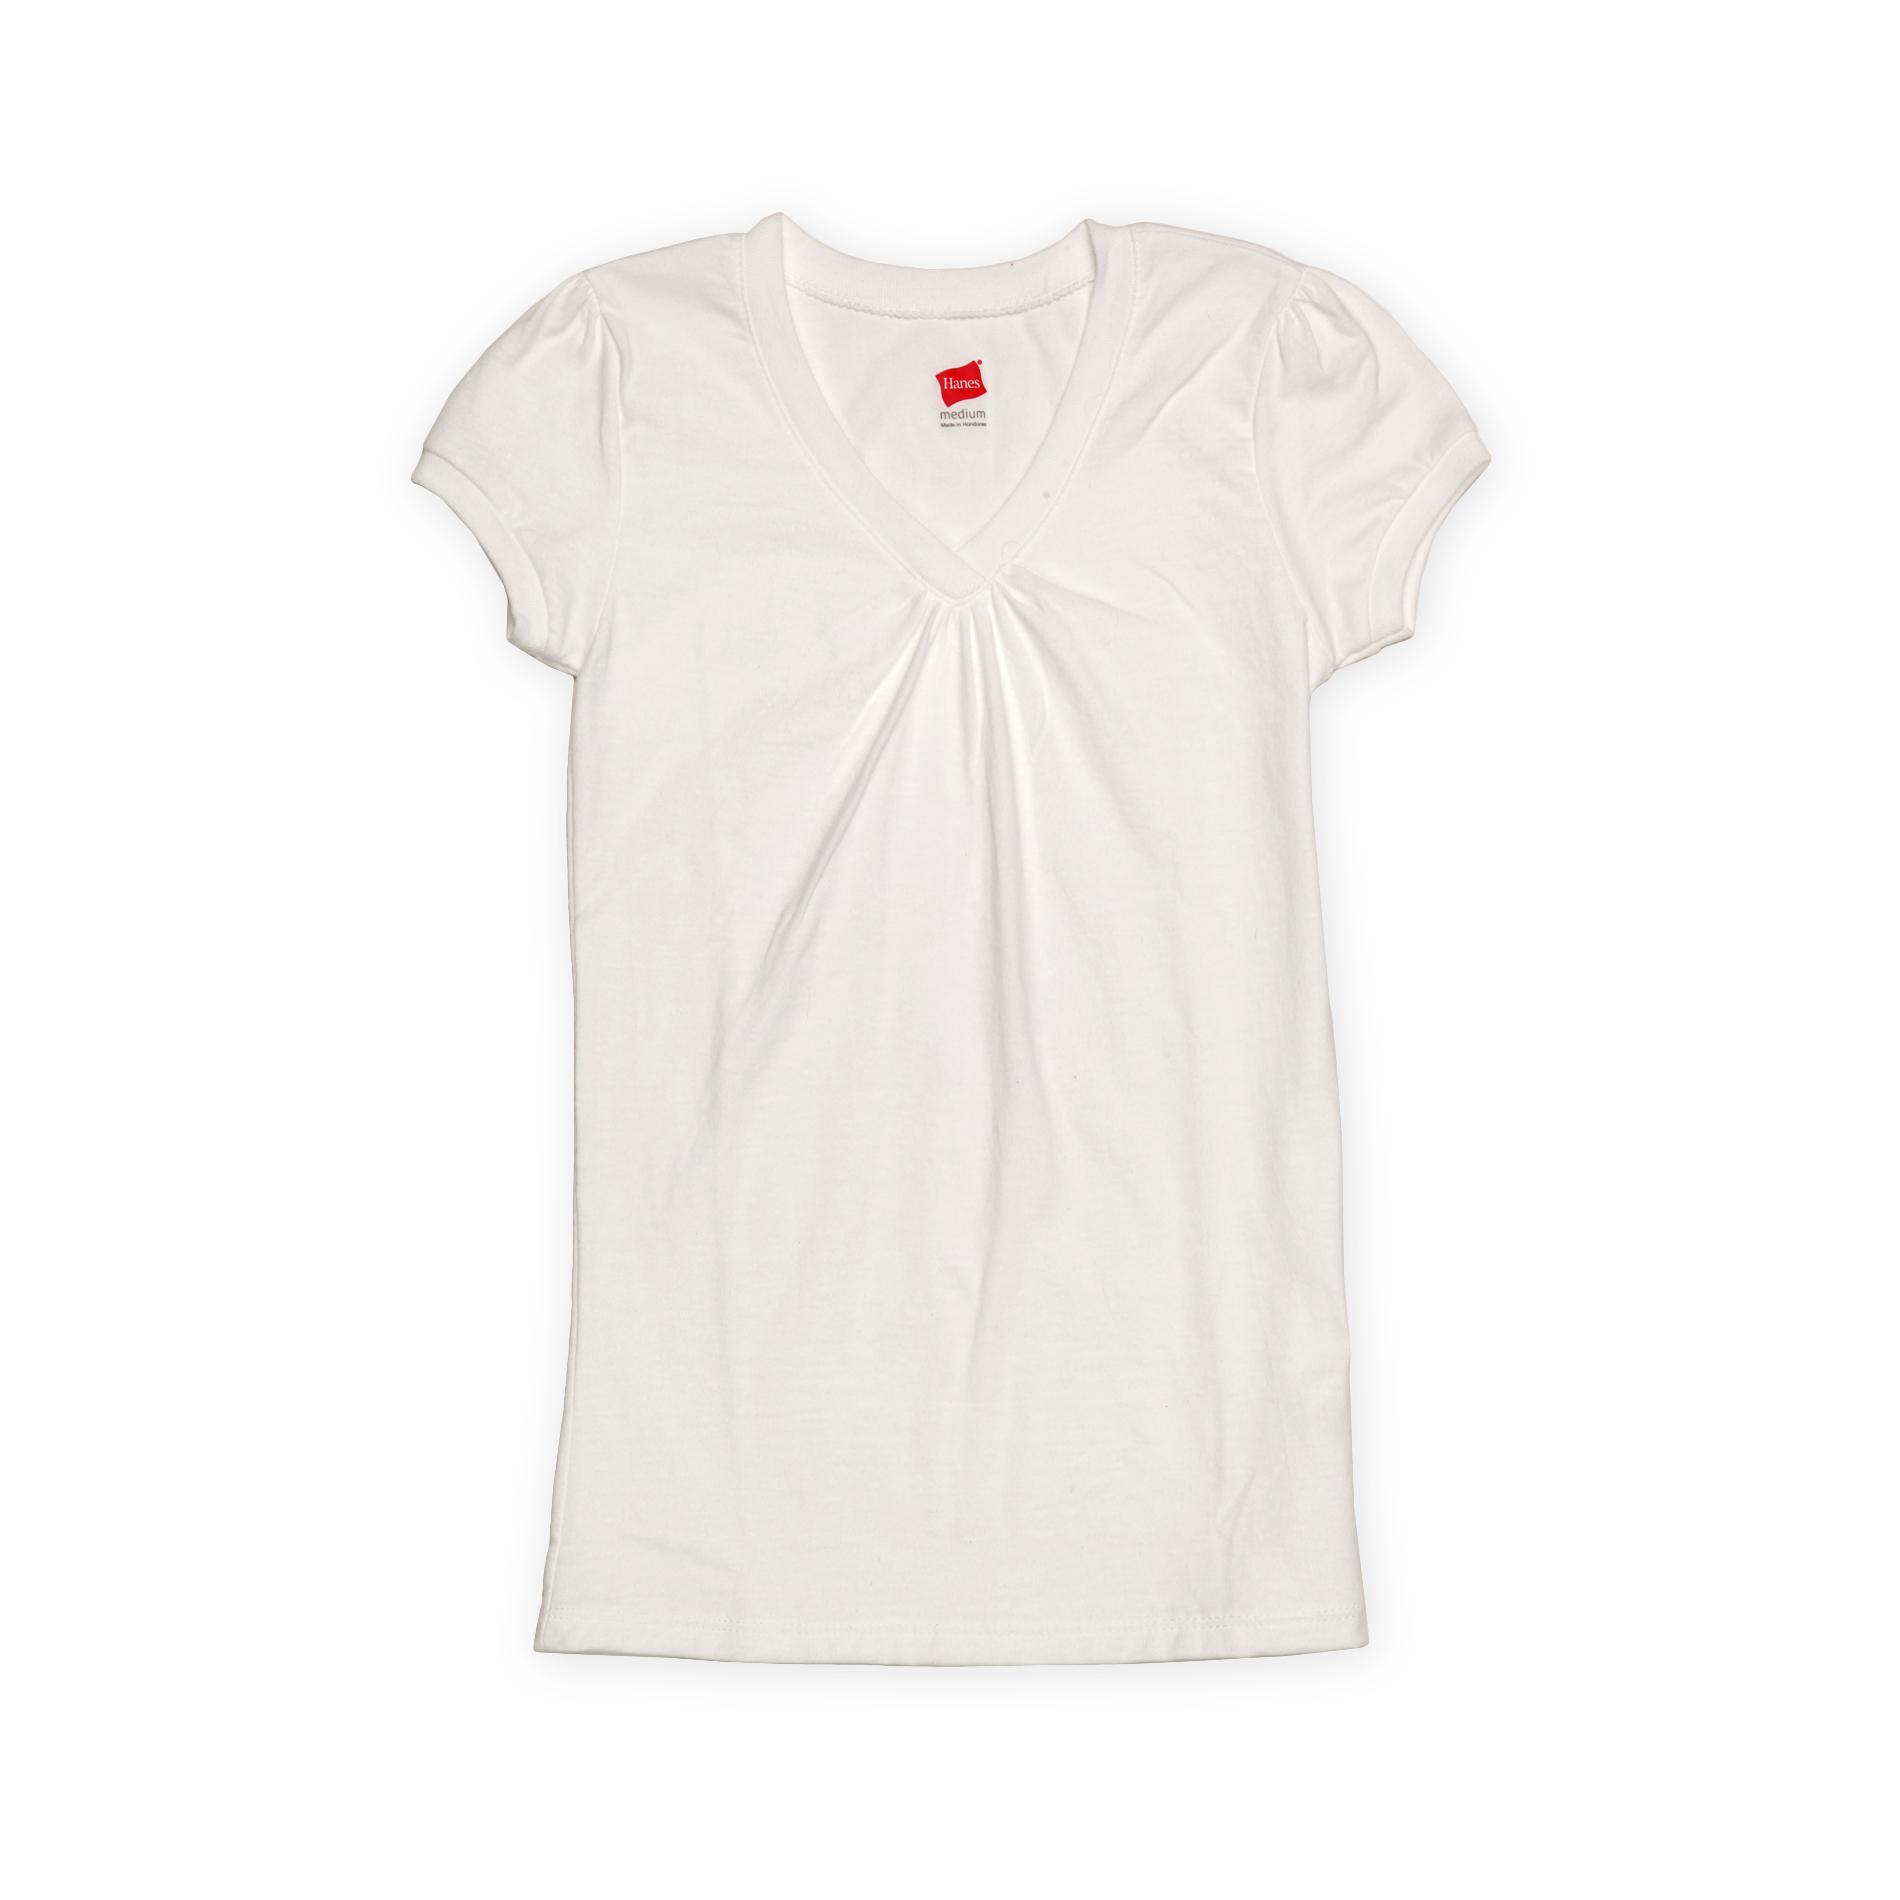 Hanes Girl's Shirred V-Neck T-Shirt